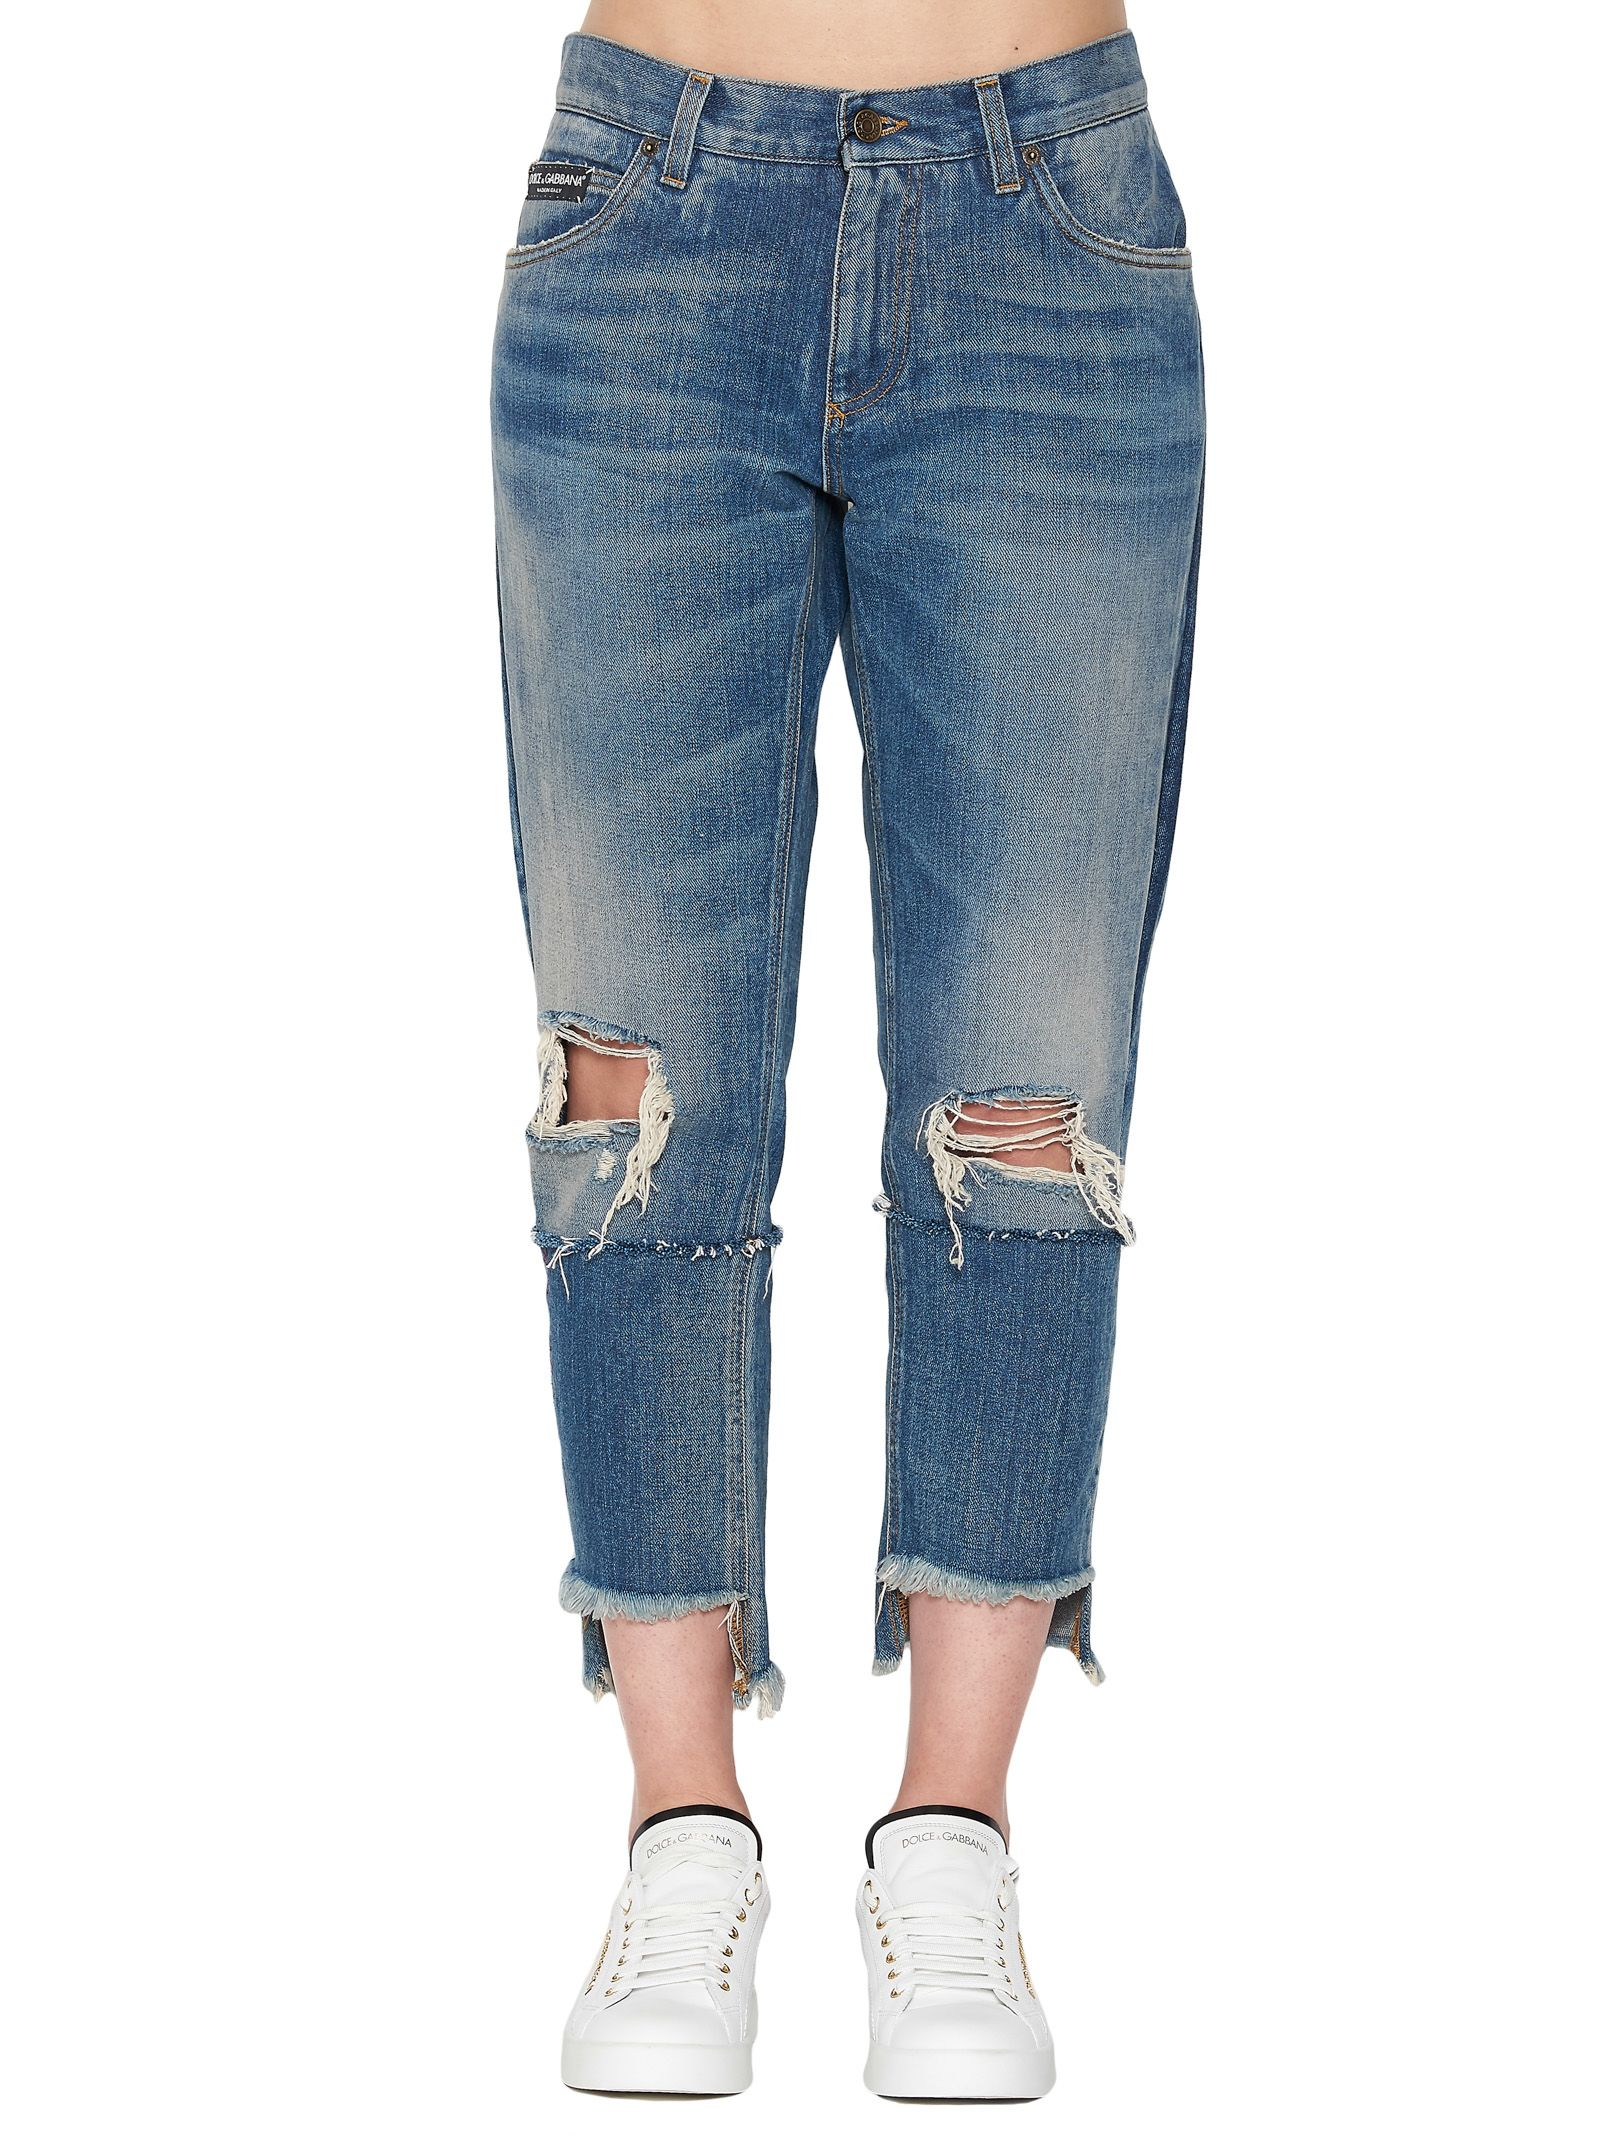 8eaae0a581558 Jeans Dolce Gabbana Damen